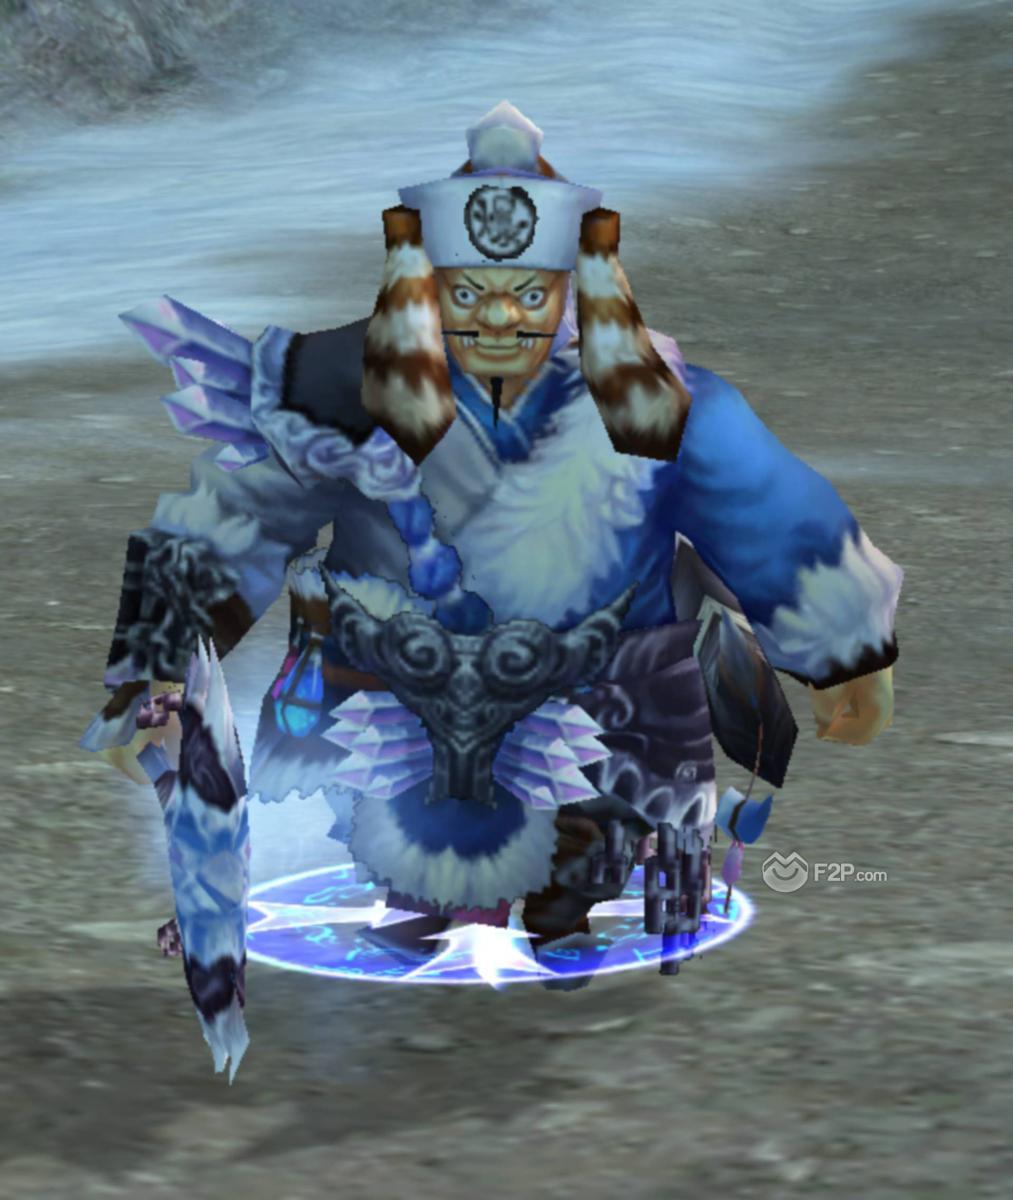 Click image for larger version.Name:Legend of Martial Arts 137.jpgViews:130Size:110.8 KBID:2635